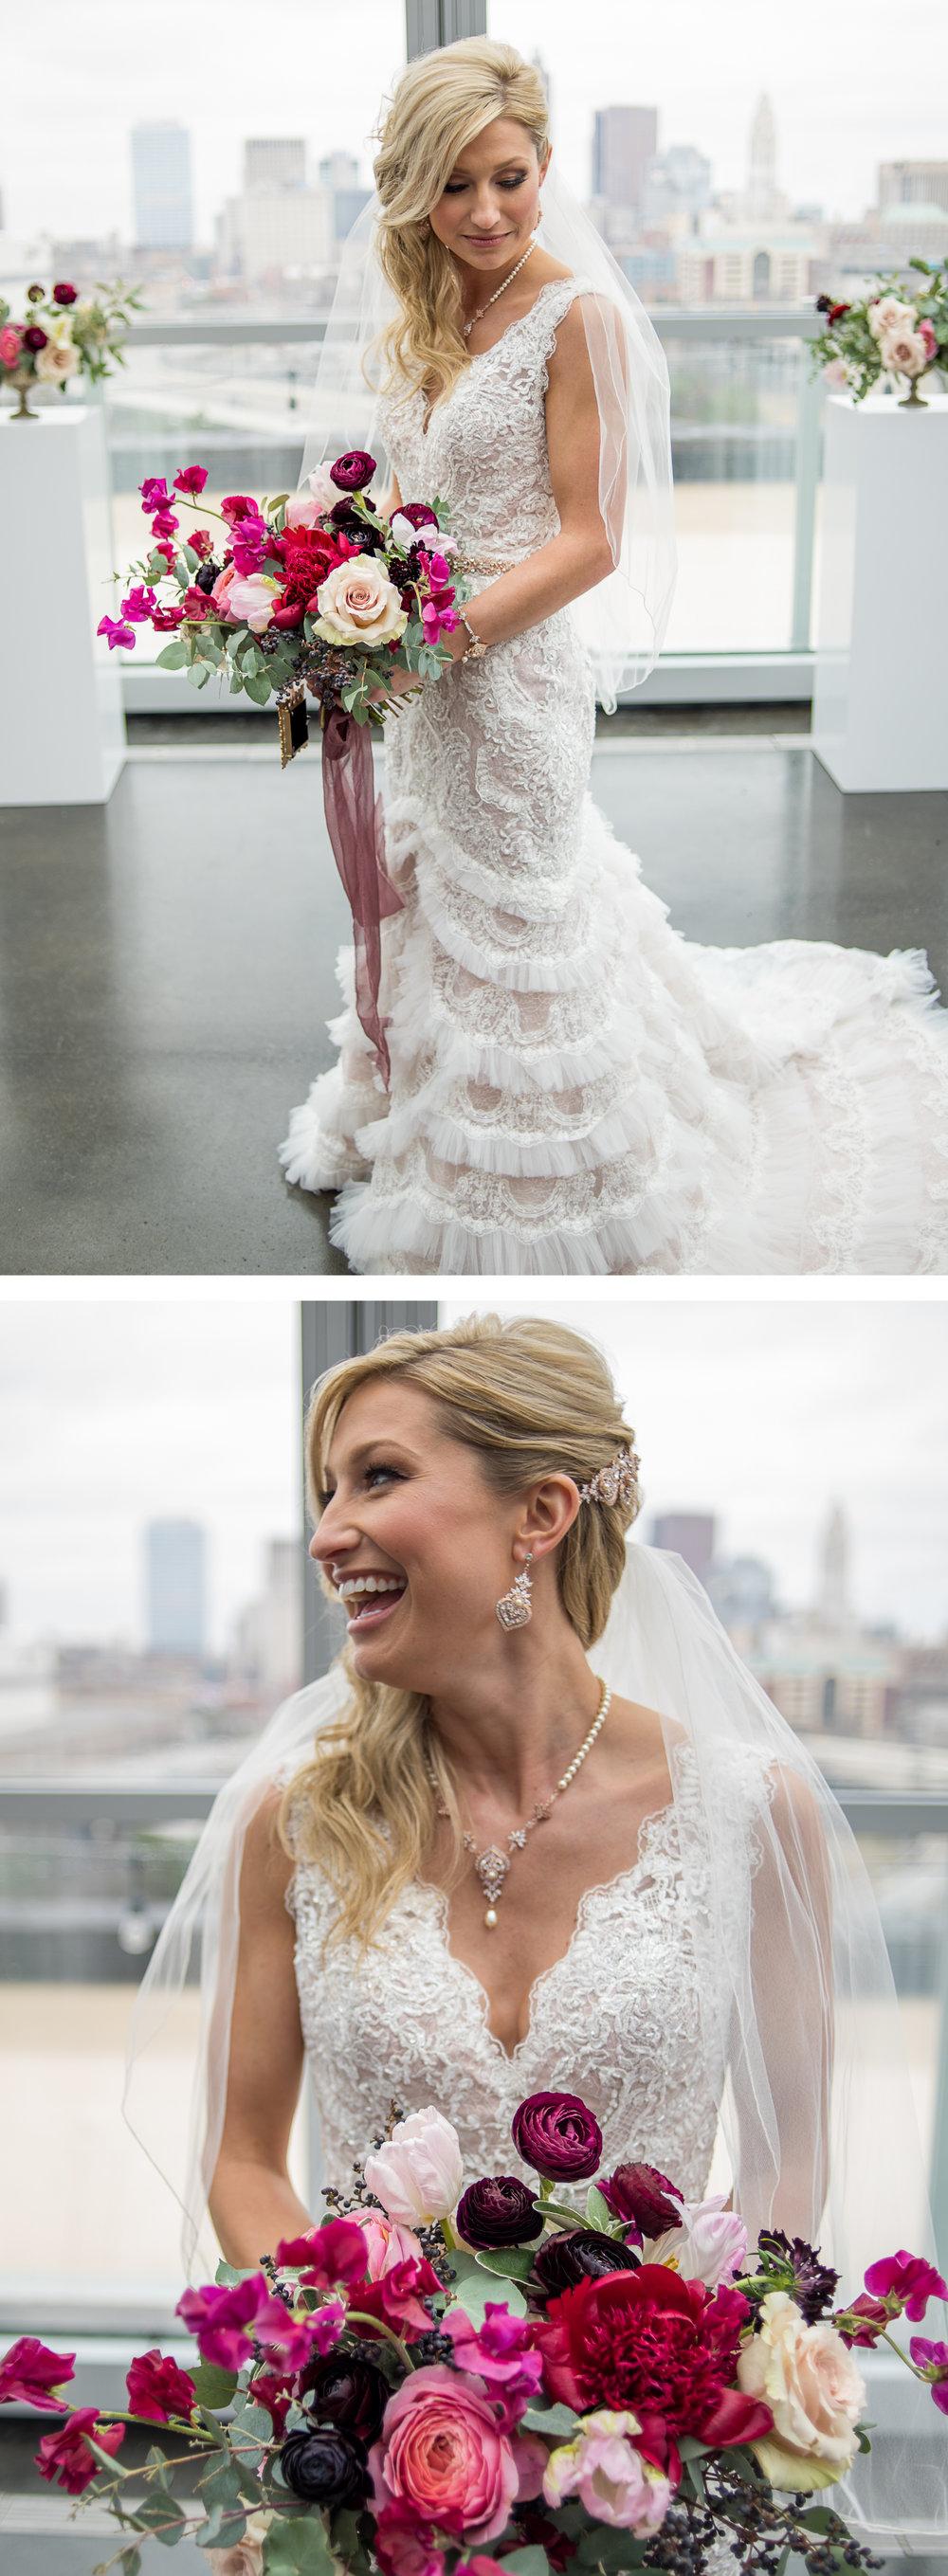 Brett Loves Elle, Columbus Wedding Photographers, Columbus Wedding Photography, Ohio Wedding, Juniper Rooftop Wedding, Vintage Glam Wedding